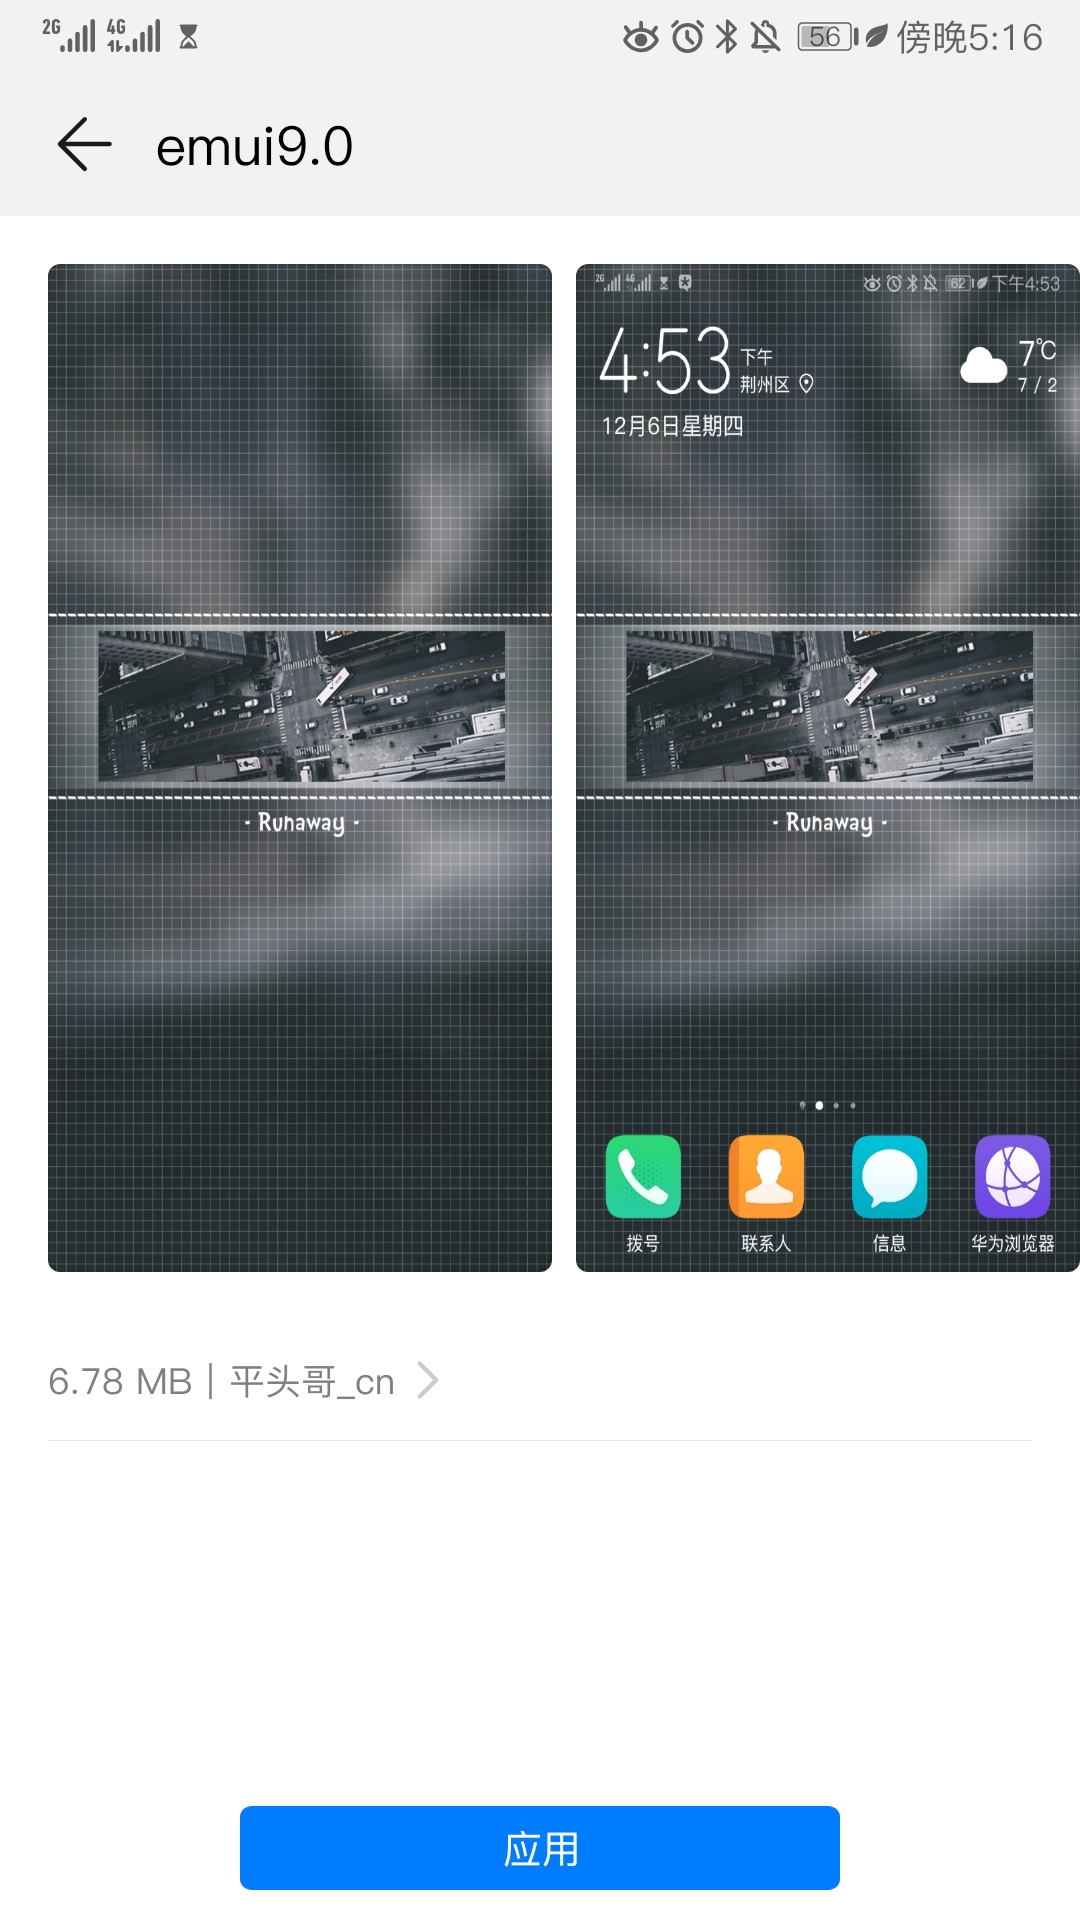 Screenshot_20181206_171607_com.huawei.android.thememanager.jpg